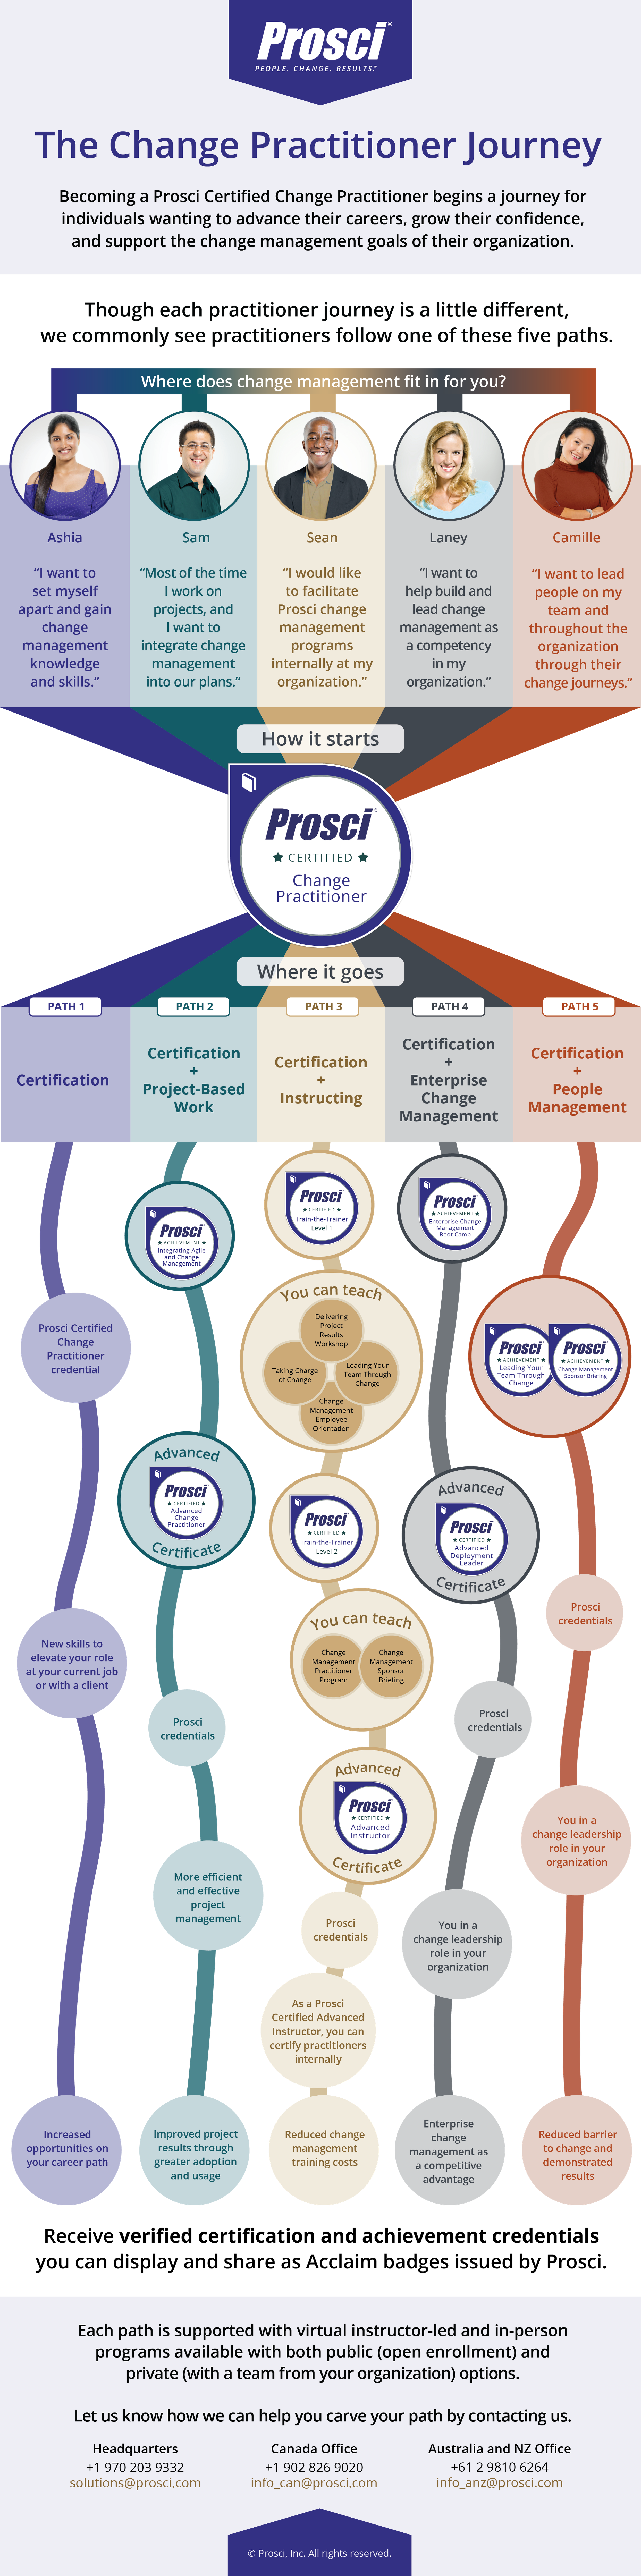 Prosci-Change-Practitioner-Journey-Infographic-300dpi